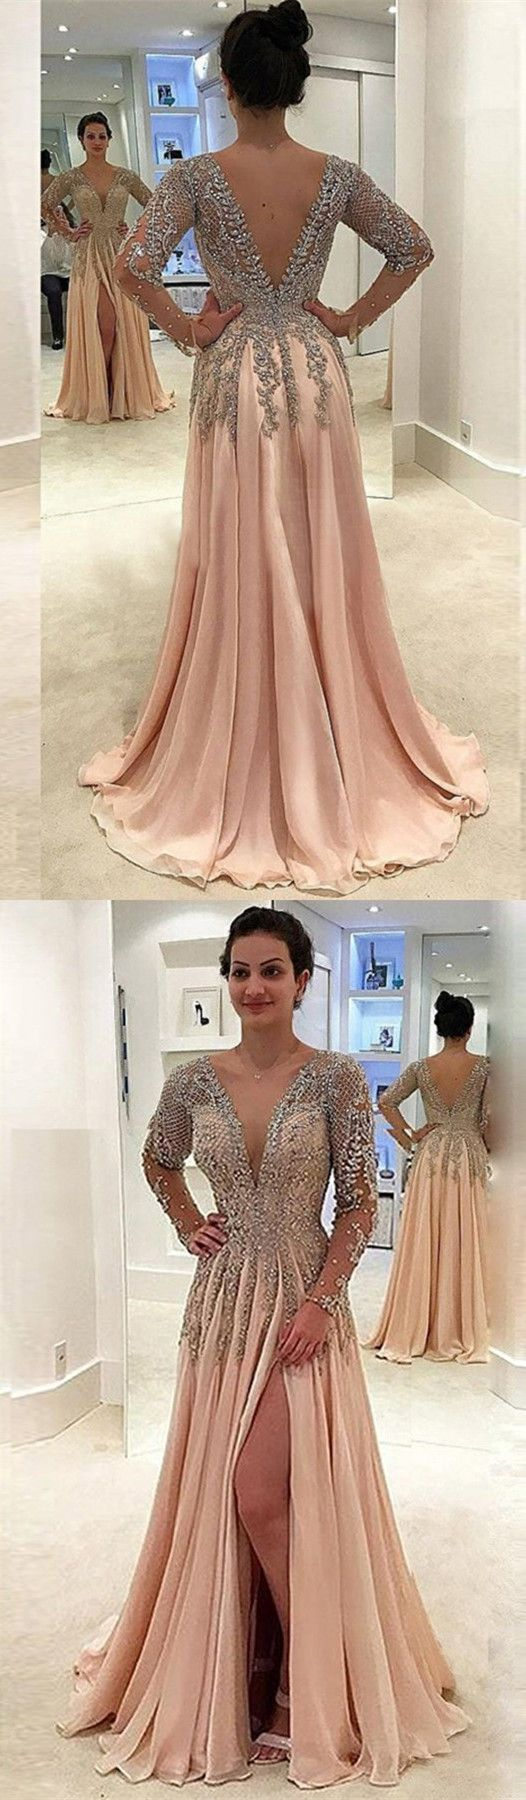 elegant champagne formal dresses with plunging neckline , modest evening gowns with v-back, #evening